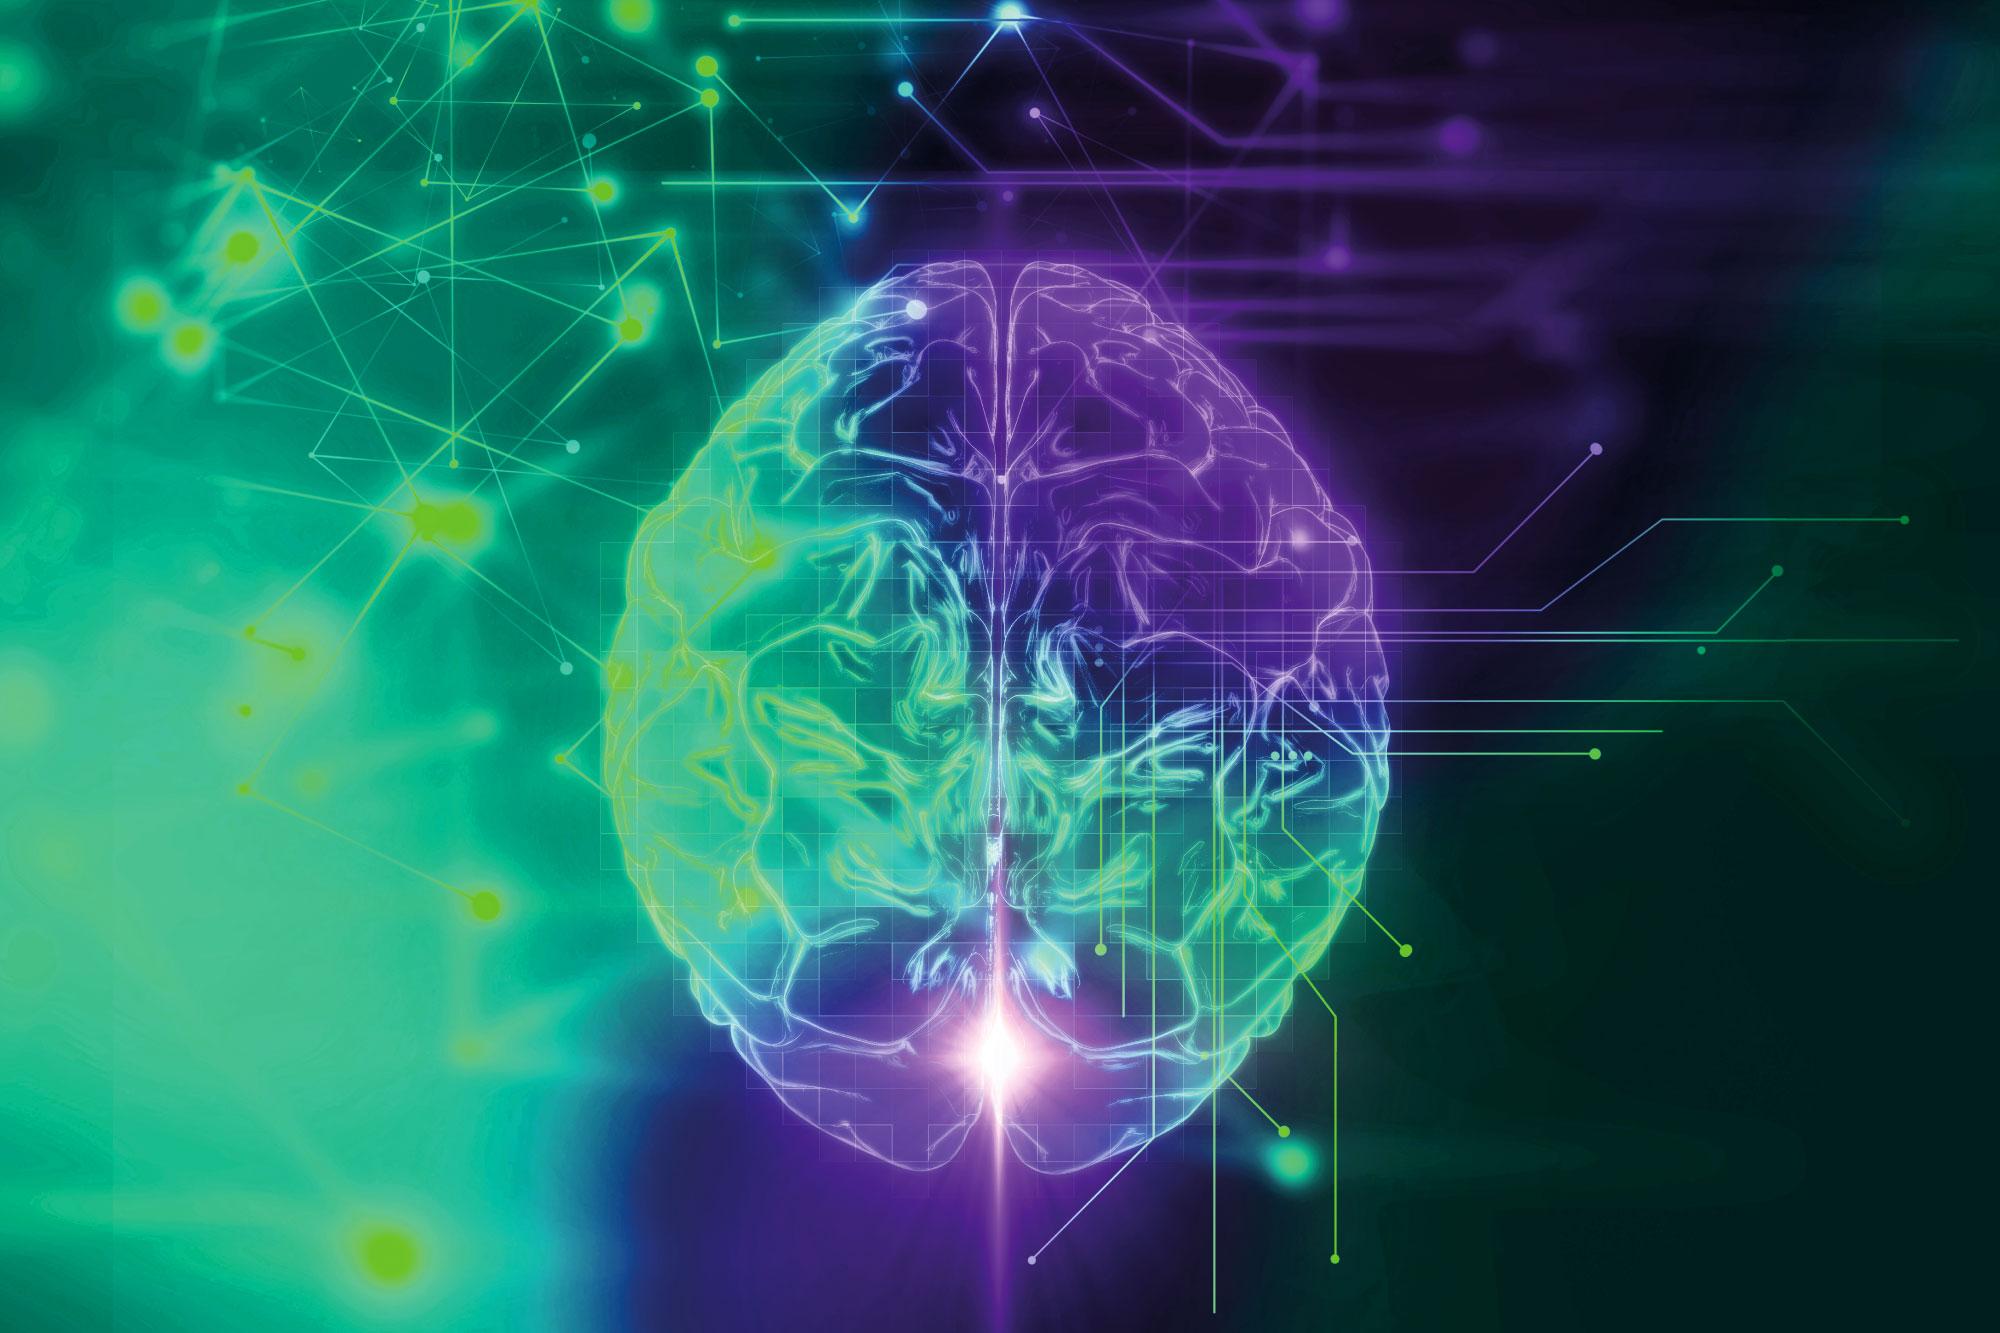 Hjärnhälsa